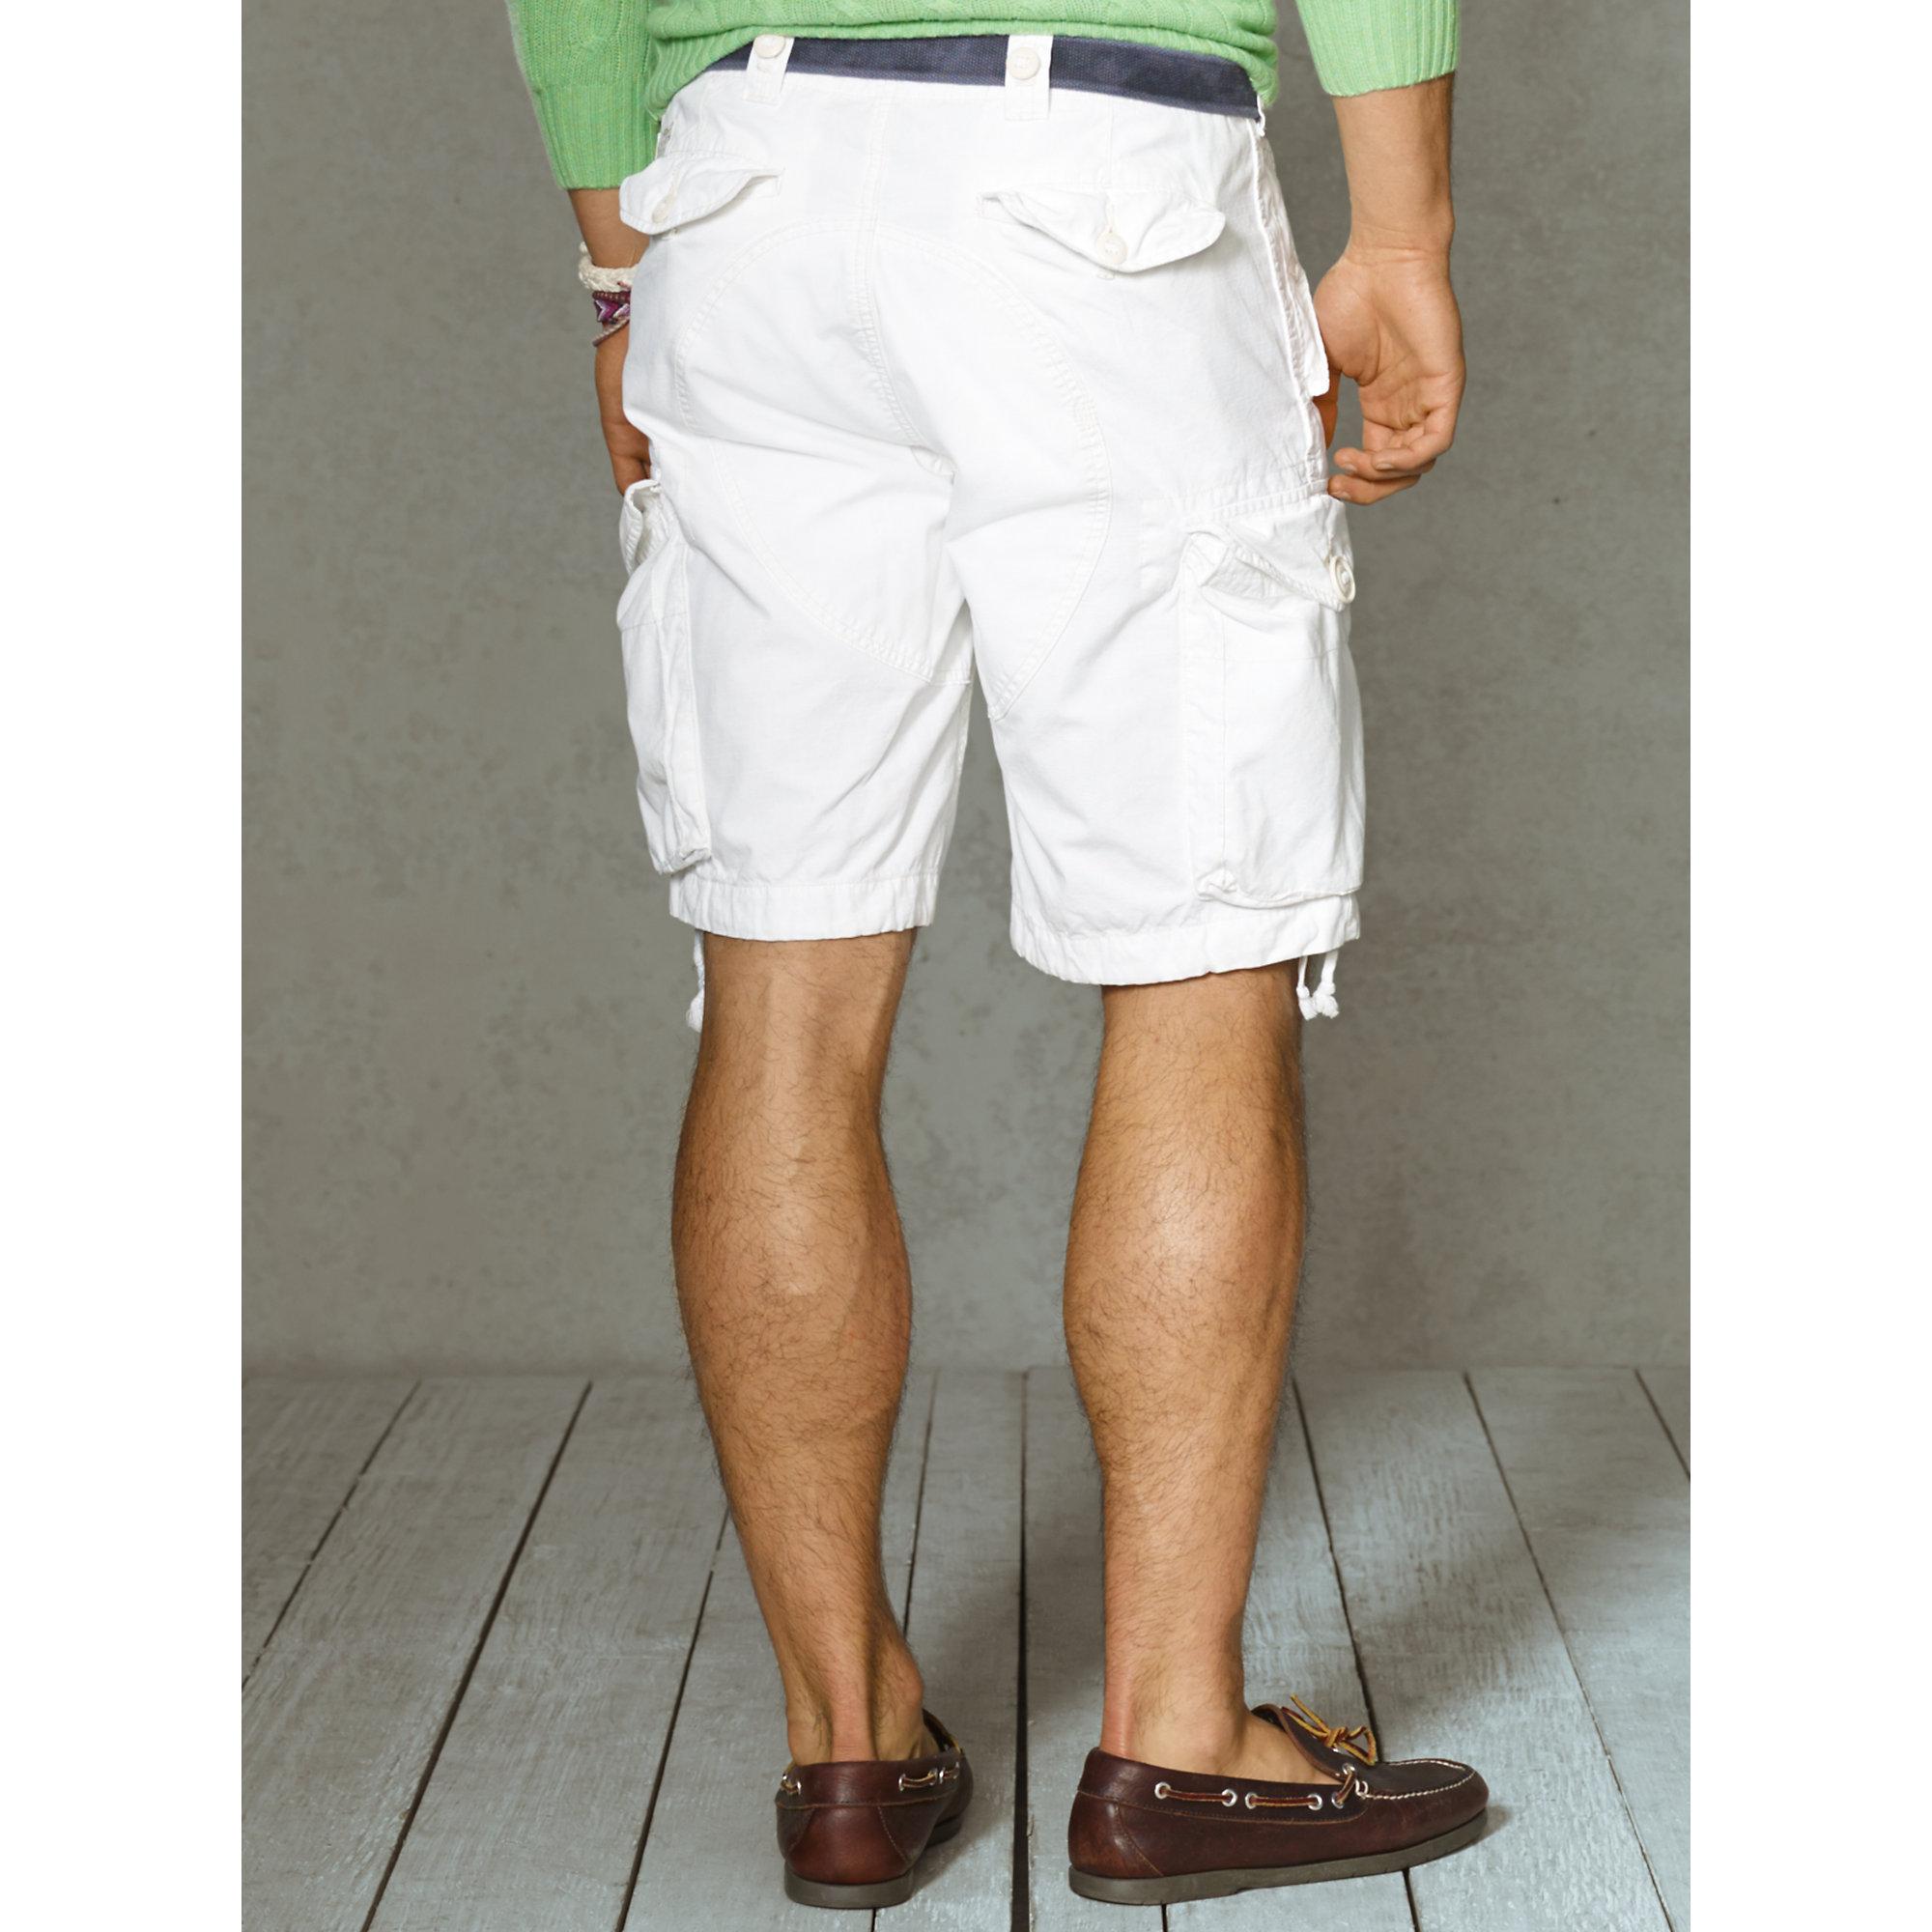 55313e2167 switzerland polo ralph lauren shorts ebac5 ddfc2; cheapest lyst polo ralph  lauren classic fit cargo short in white for men 41ef7 f4ccc